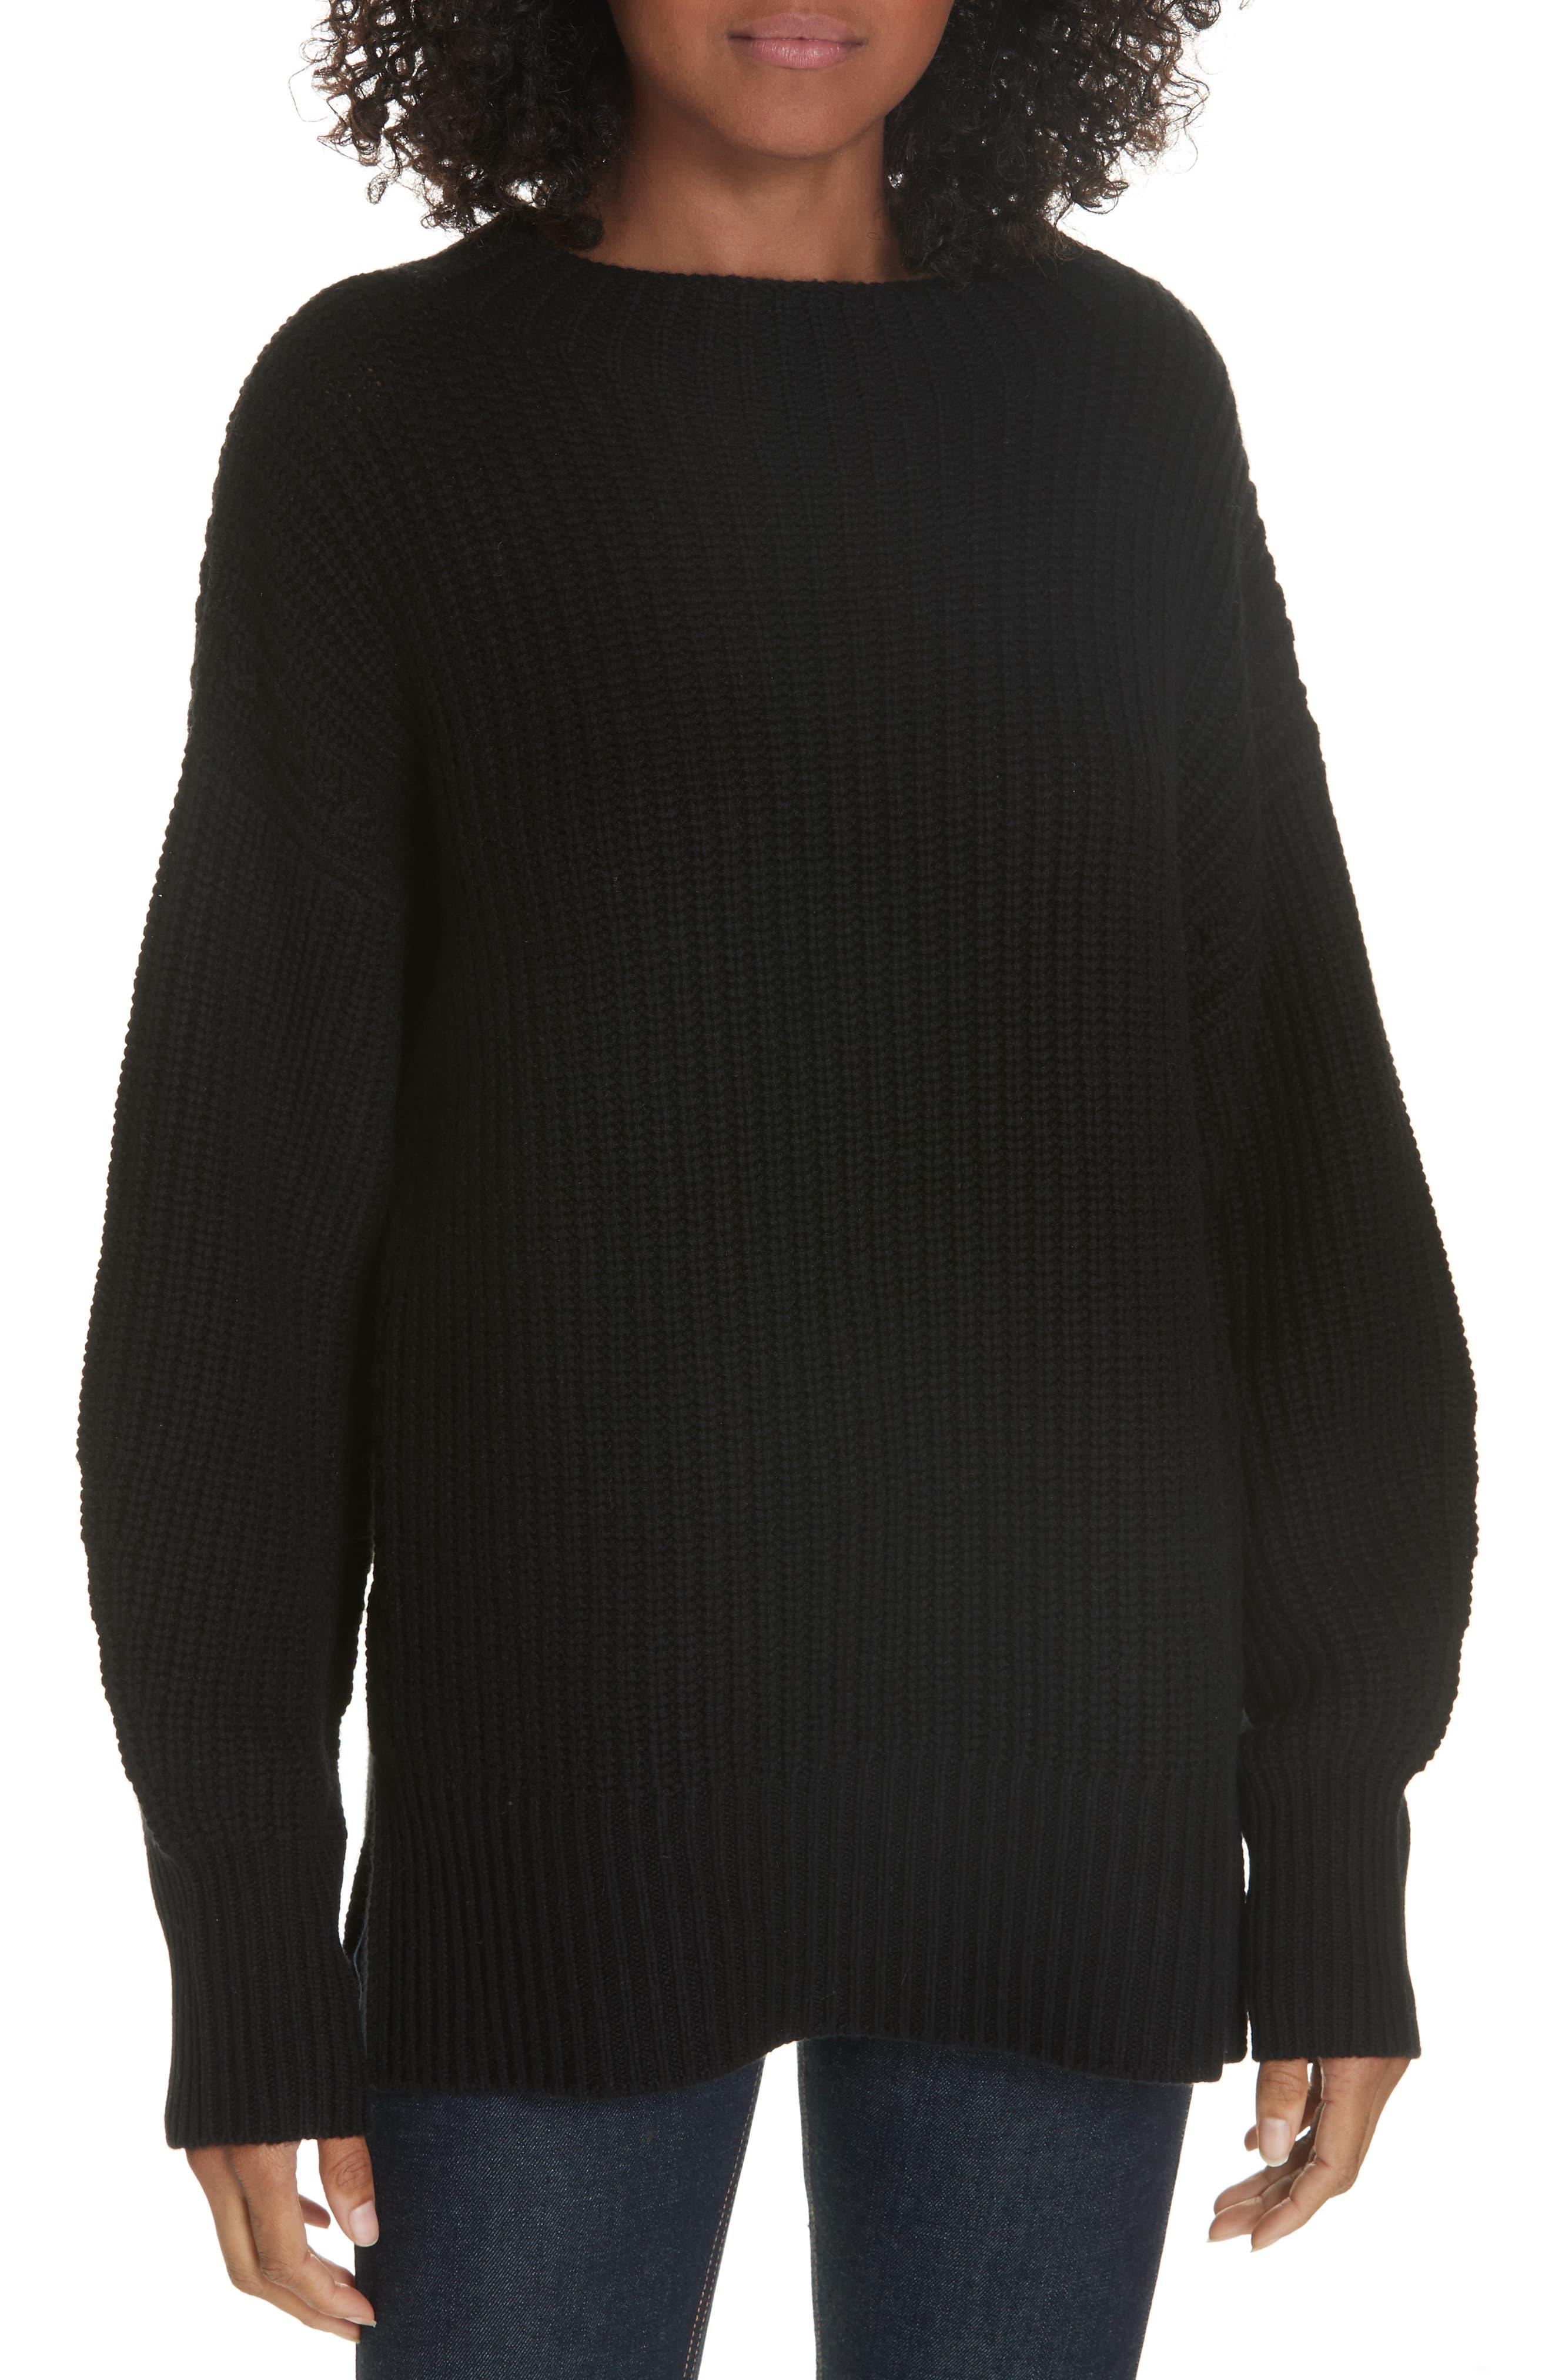 Equipment Wool Cashmere Shaker Knit Sweater, Black